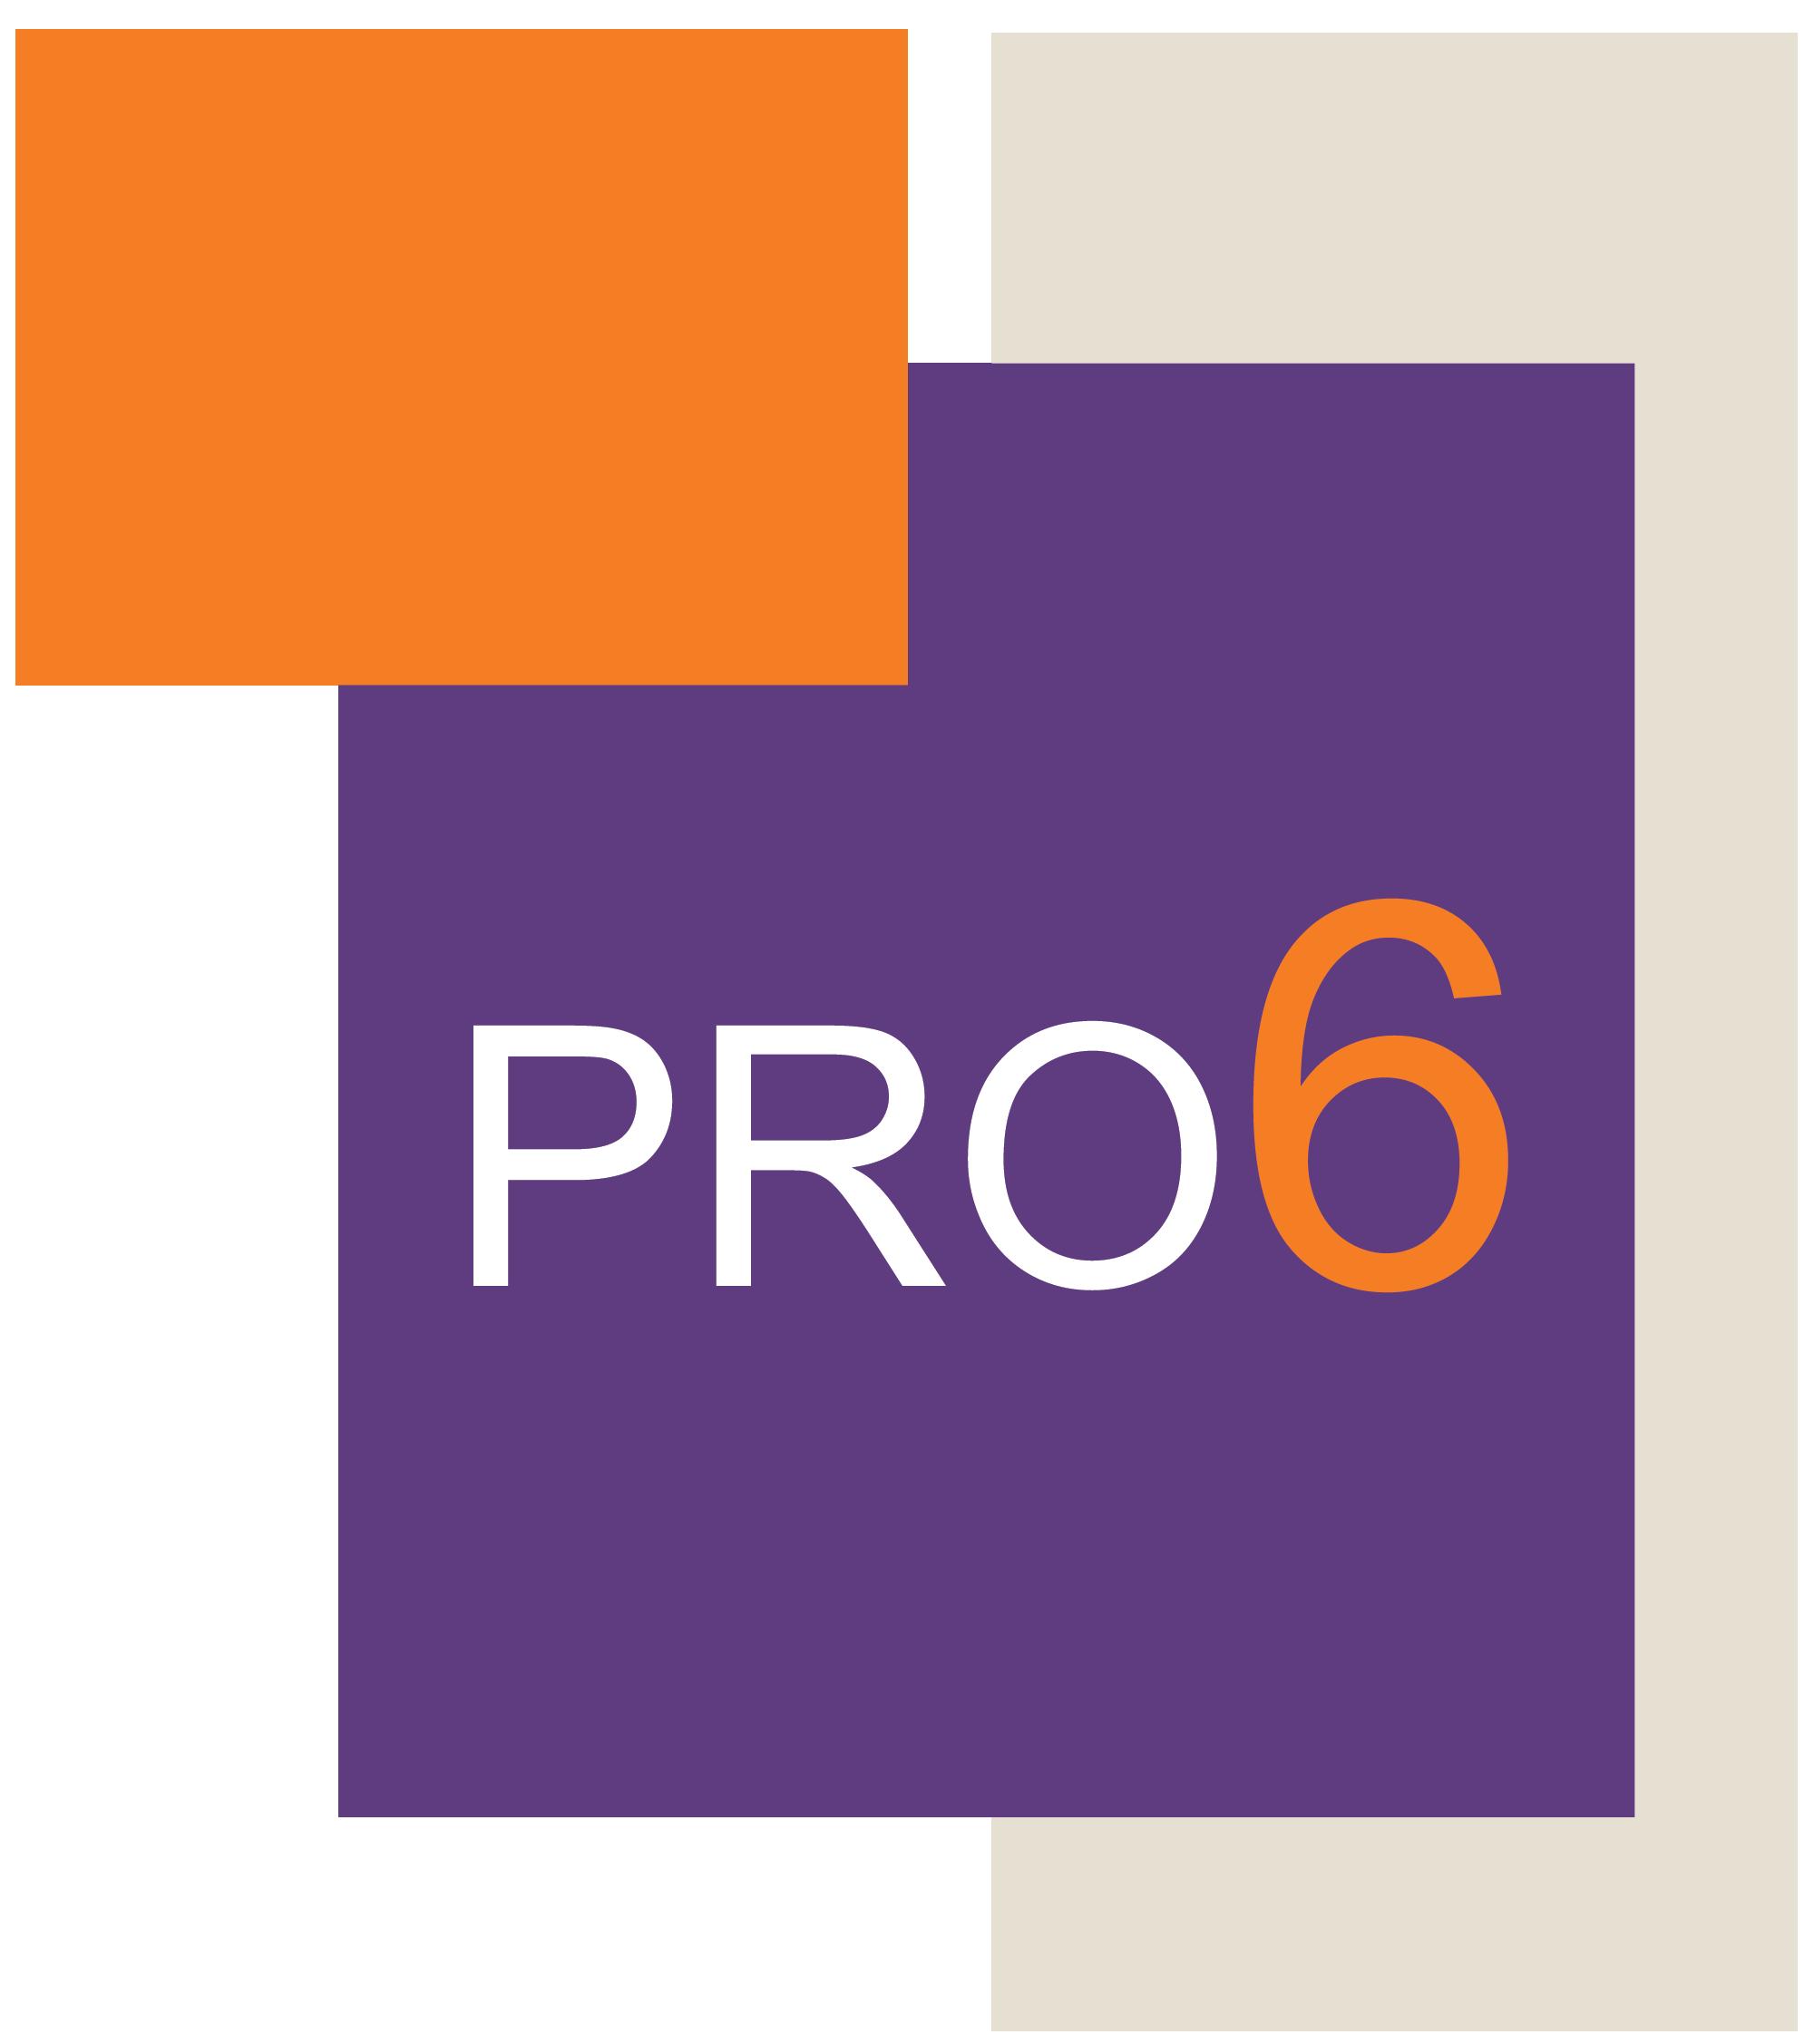 Pro6 jeugdhulpverlening